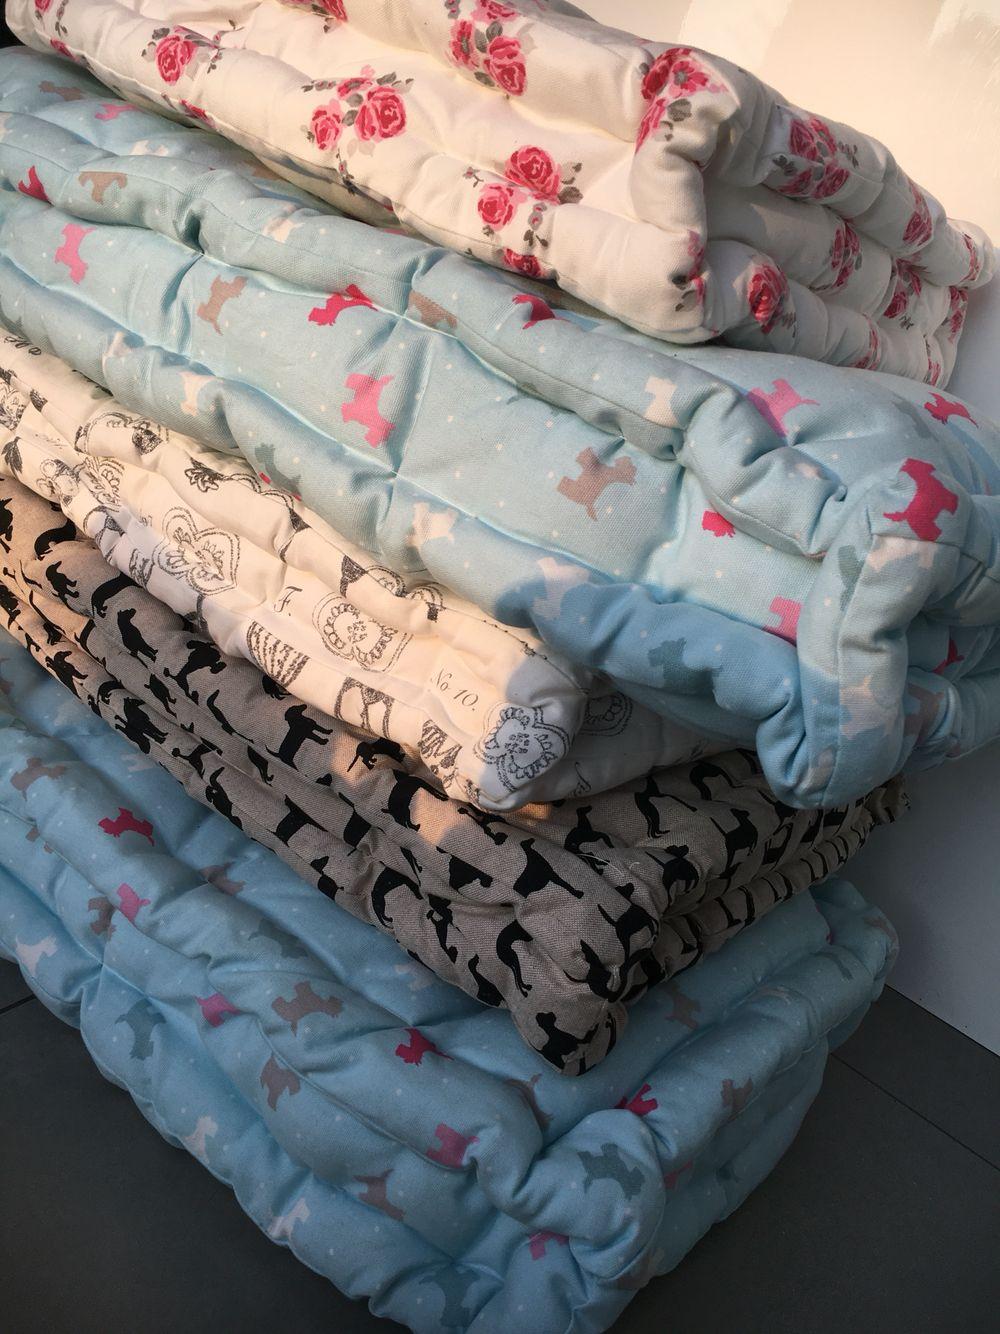 Piled Handmade Quilted Cushion Mattress Tufted Cushion